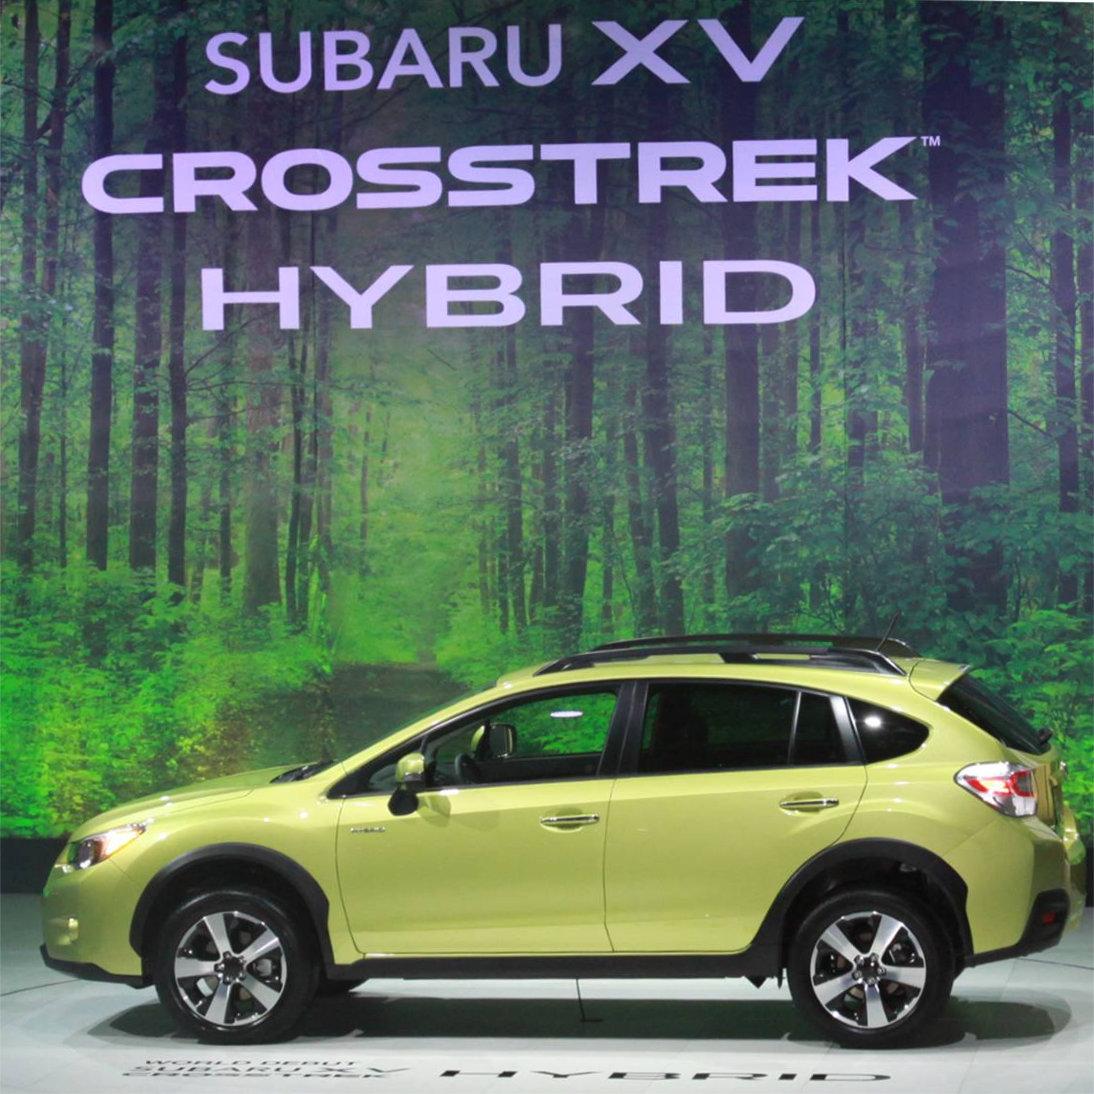 Save on Gas Mileage with the all-new 2014 Subaru XV Crosstrek Hybrid   (via @LaFontaineAuto)